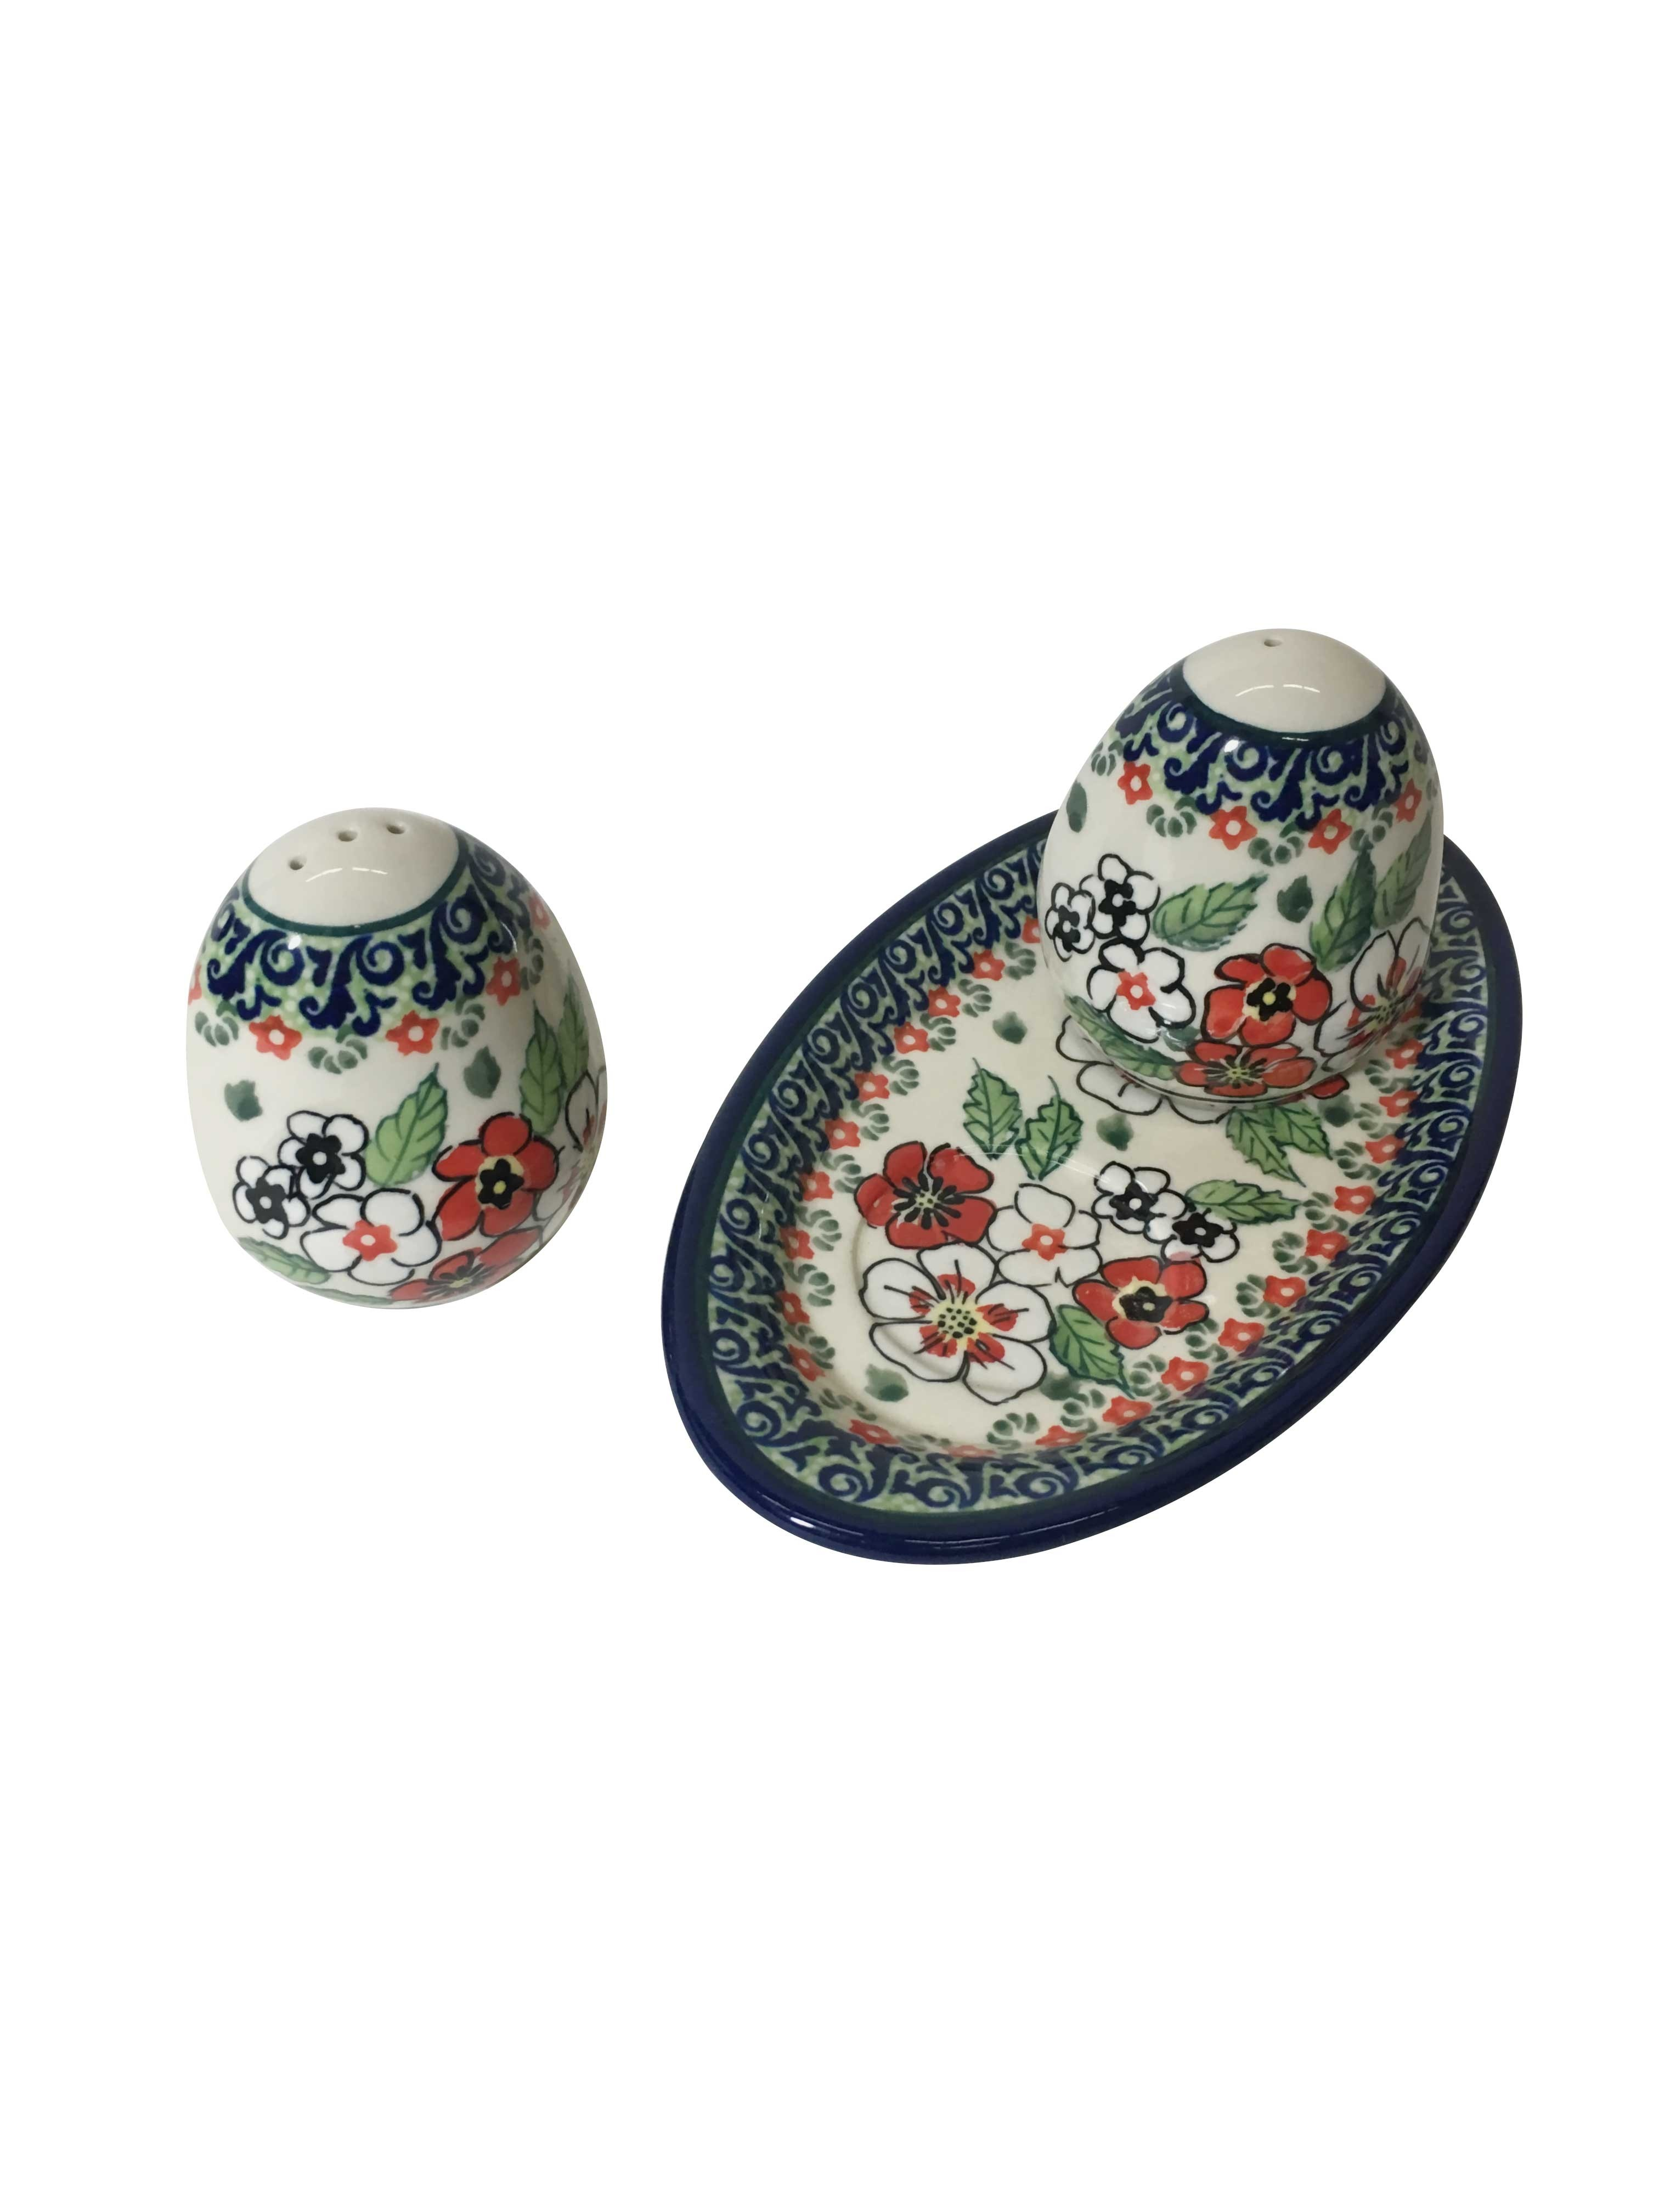 Pottery Avenue Empress 3pc Stoneware Salt and Pepper Trio Set